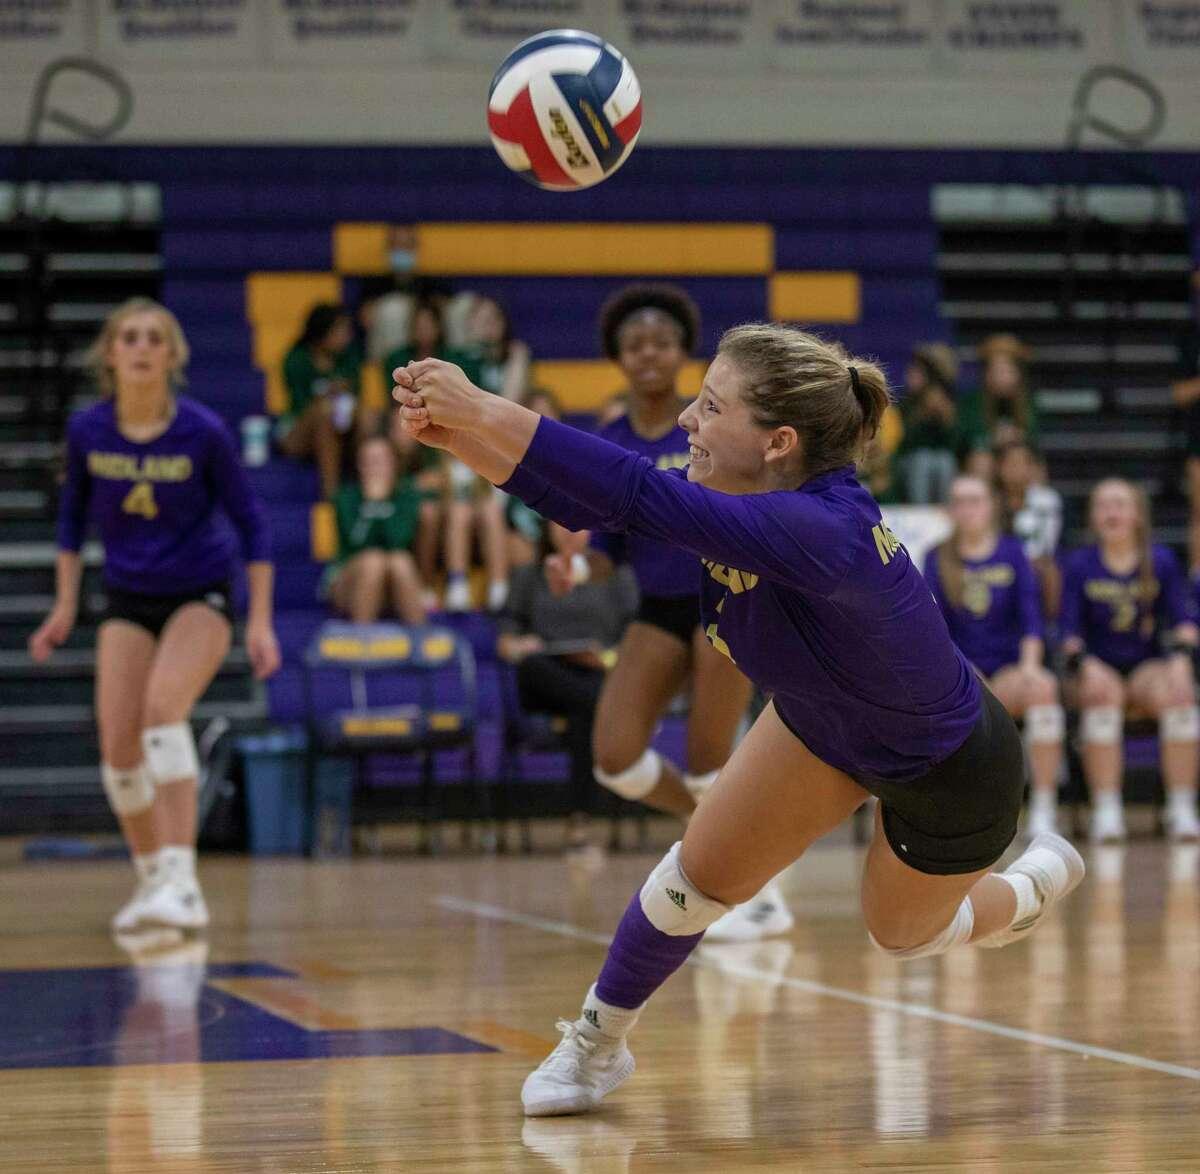 Midland High's Madison Zamora digs the ball Sept. 10, 2021 at Midland High School. Jacy Lewis/Reporter-Telegram